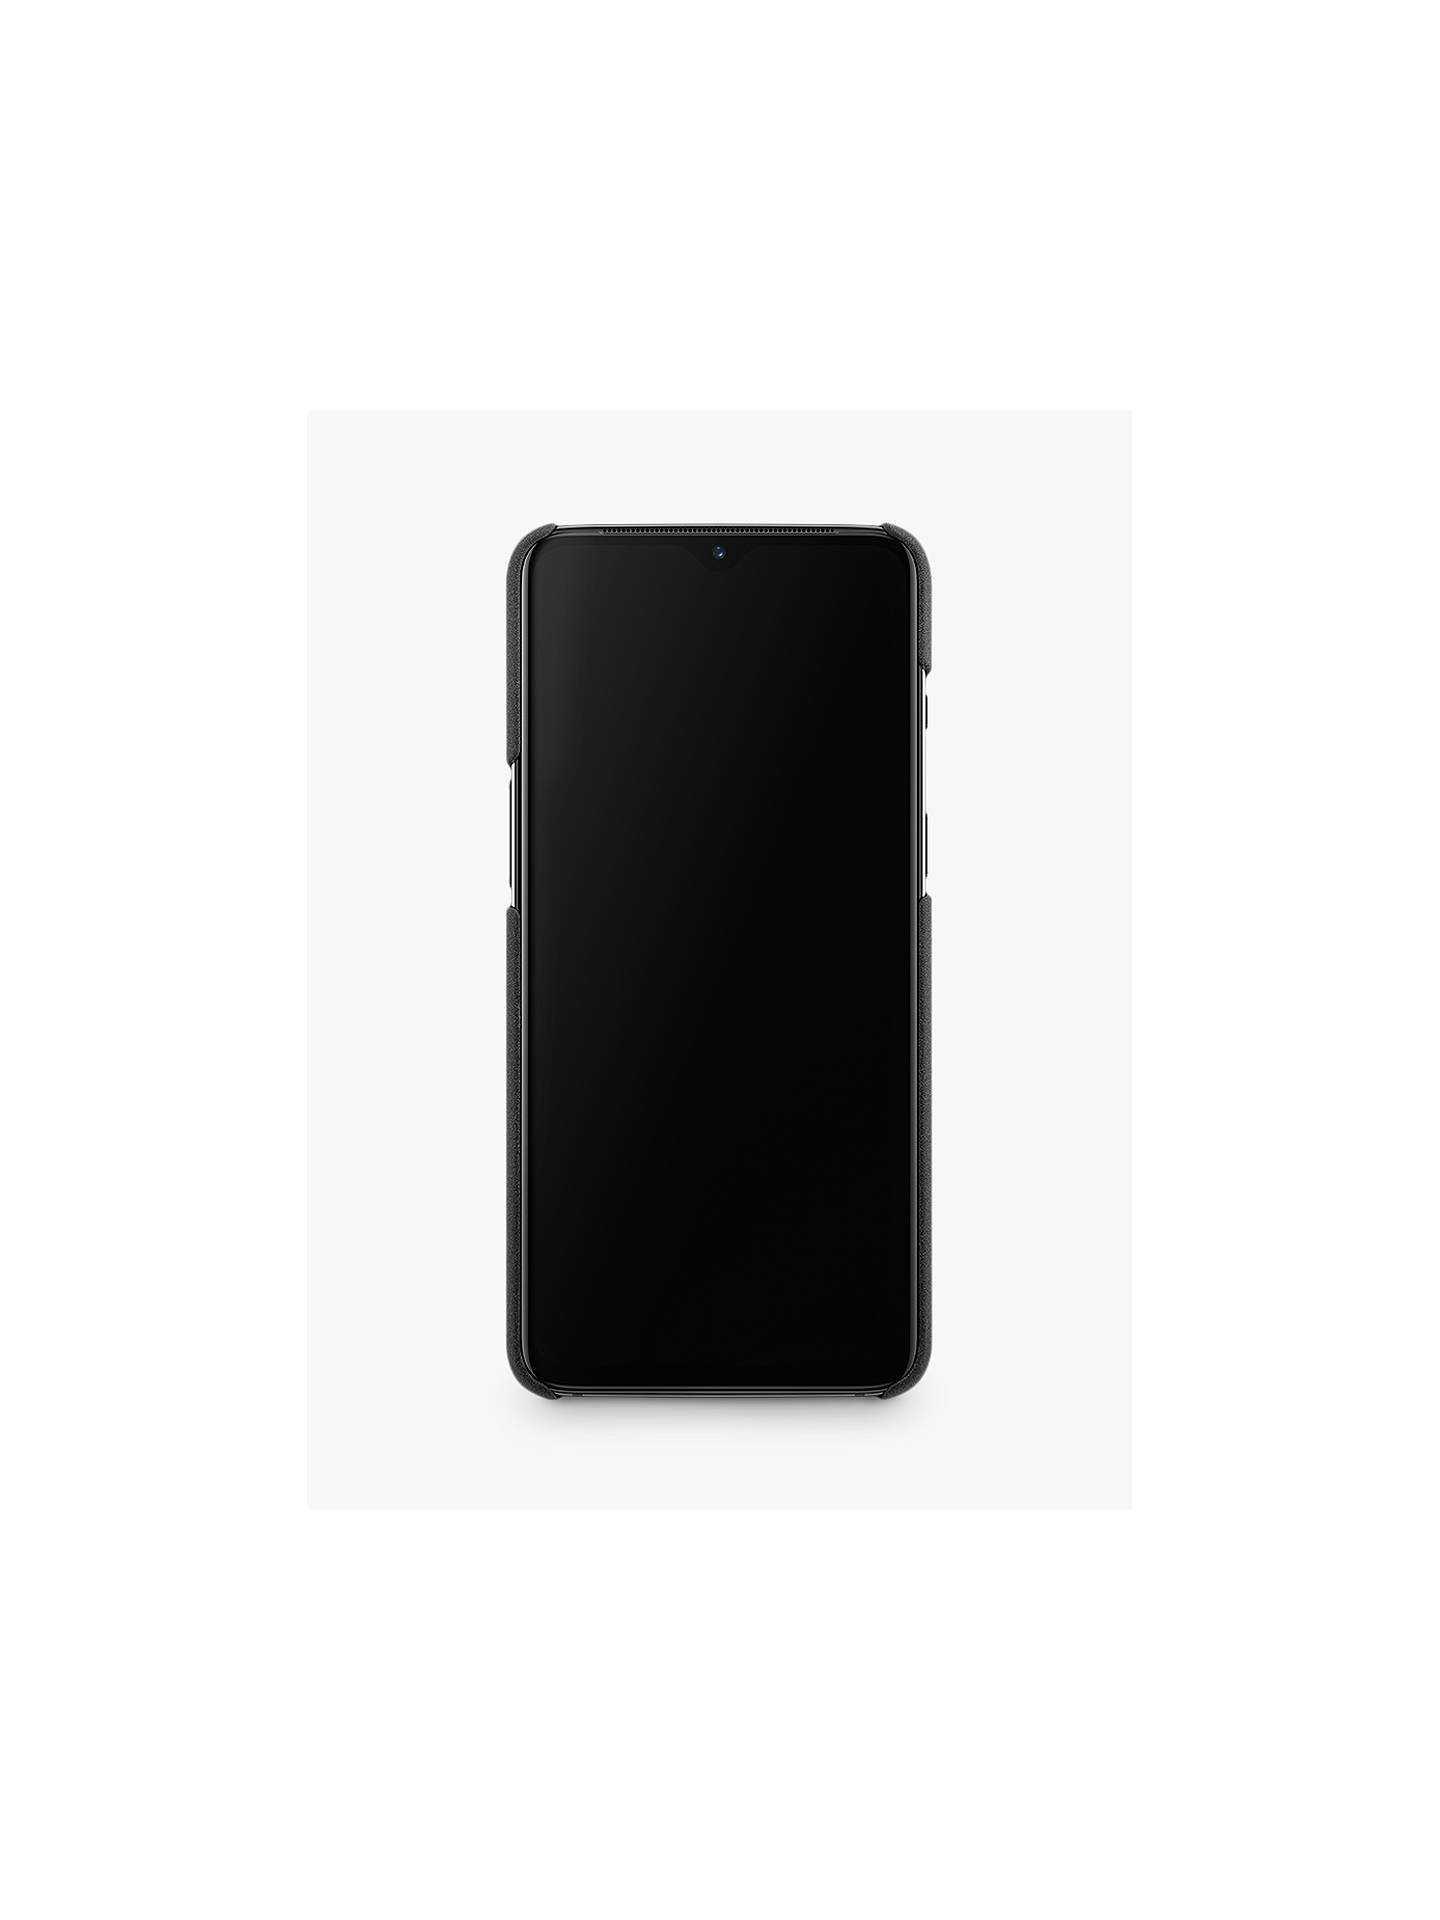 Сравнительный тест камер флагманских смартфонов: apple iphone xs max, google pixel 3 xl, huawei mate 20 pro, samsung galaxy s10+ и xiaomi mi 9 / смартфоны